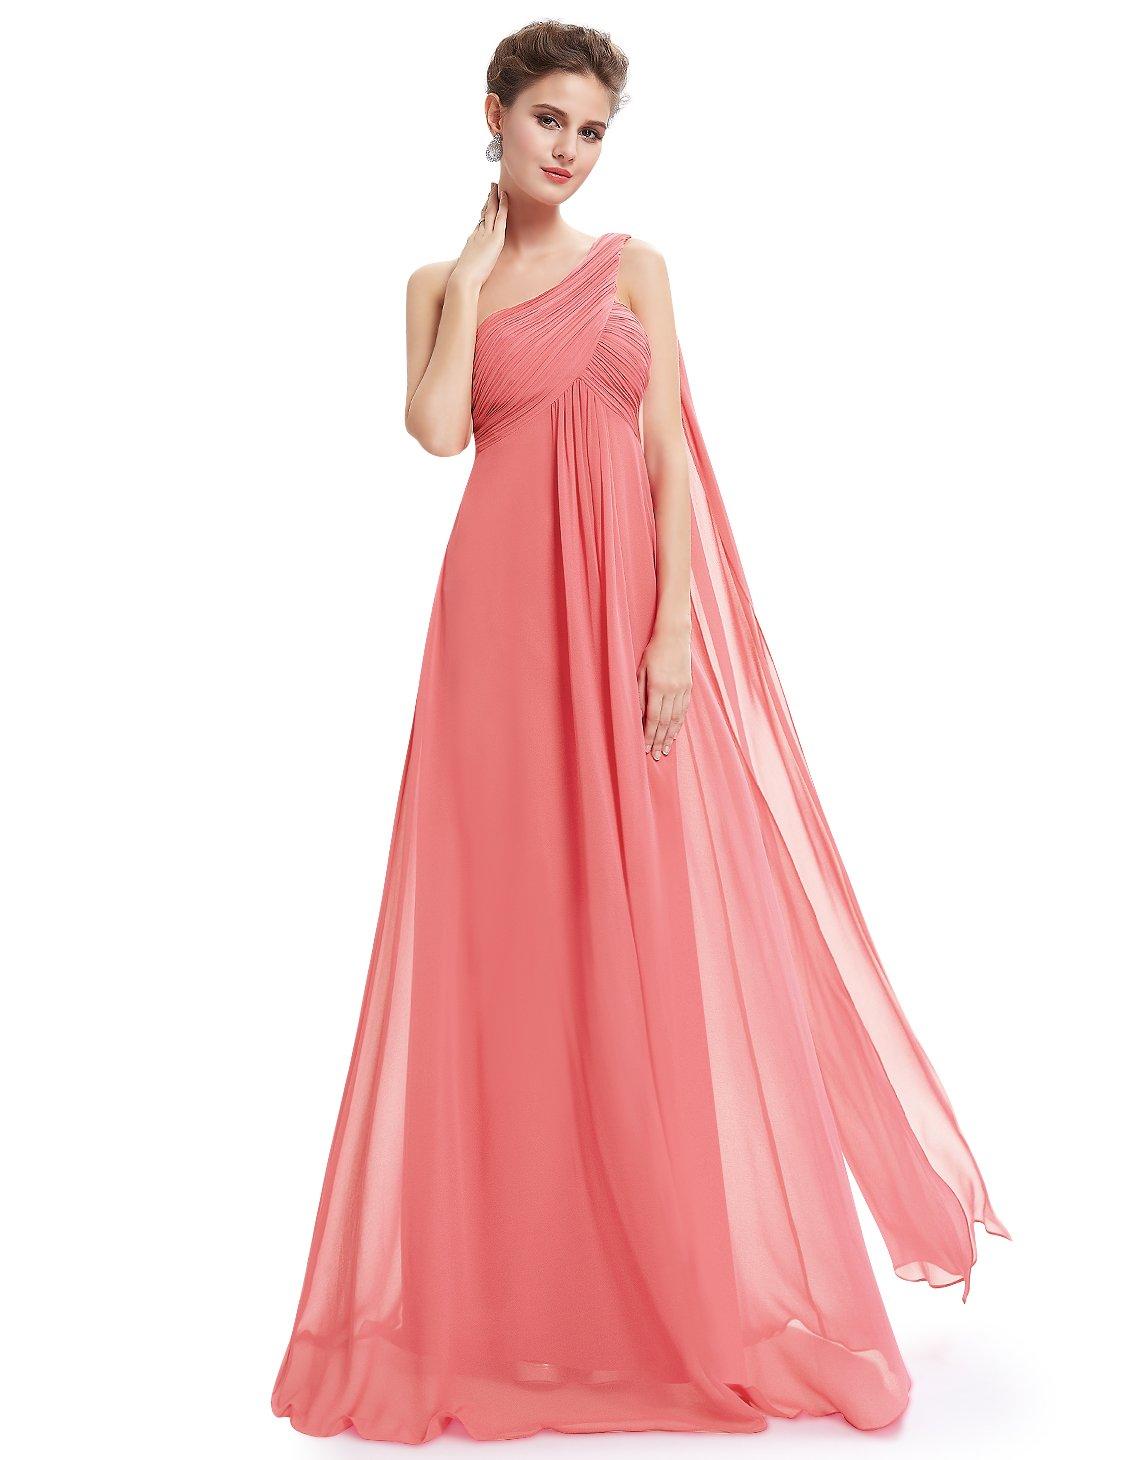 Ever-Pretty Womens Elegant One Shoulder Trailing Evening Dress 14 US Coral